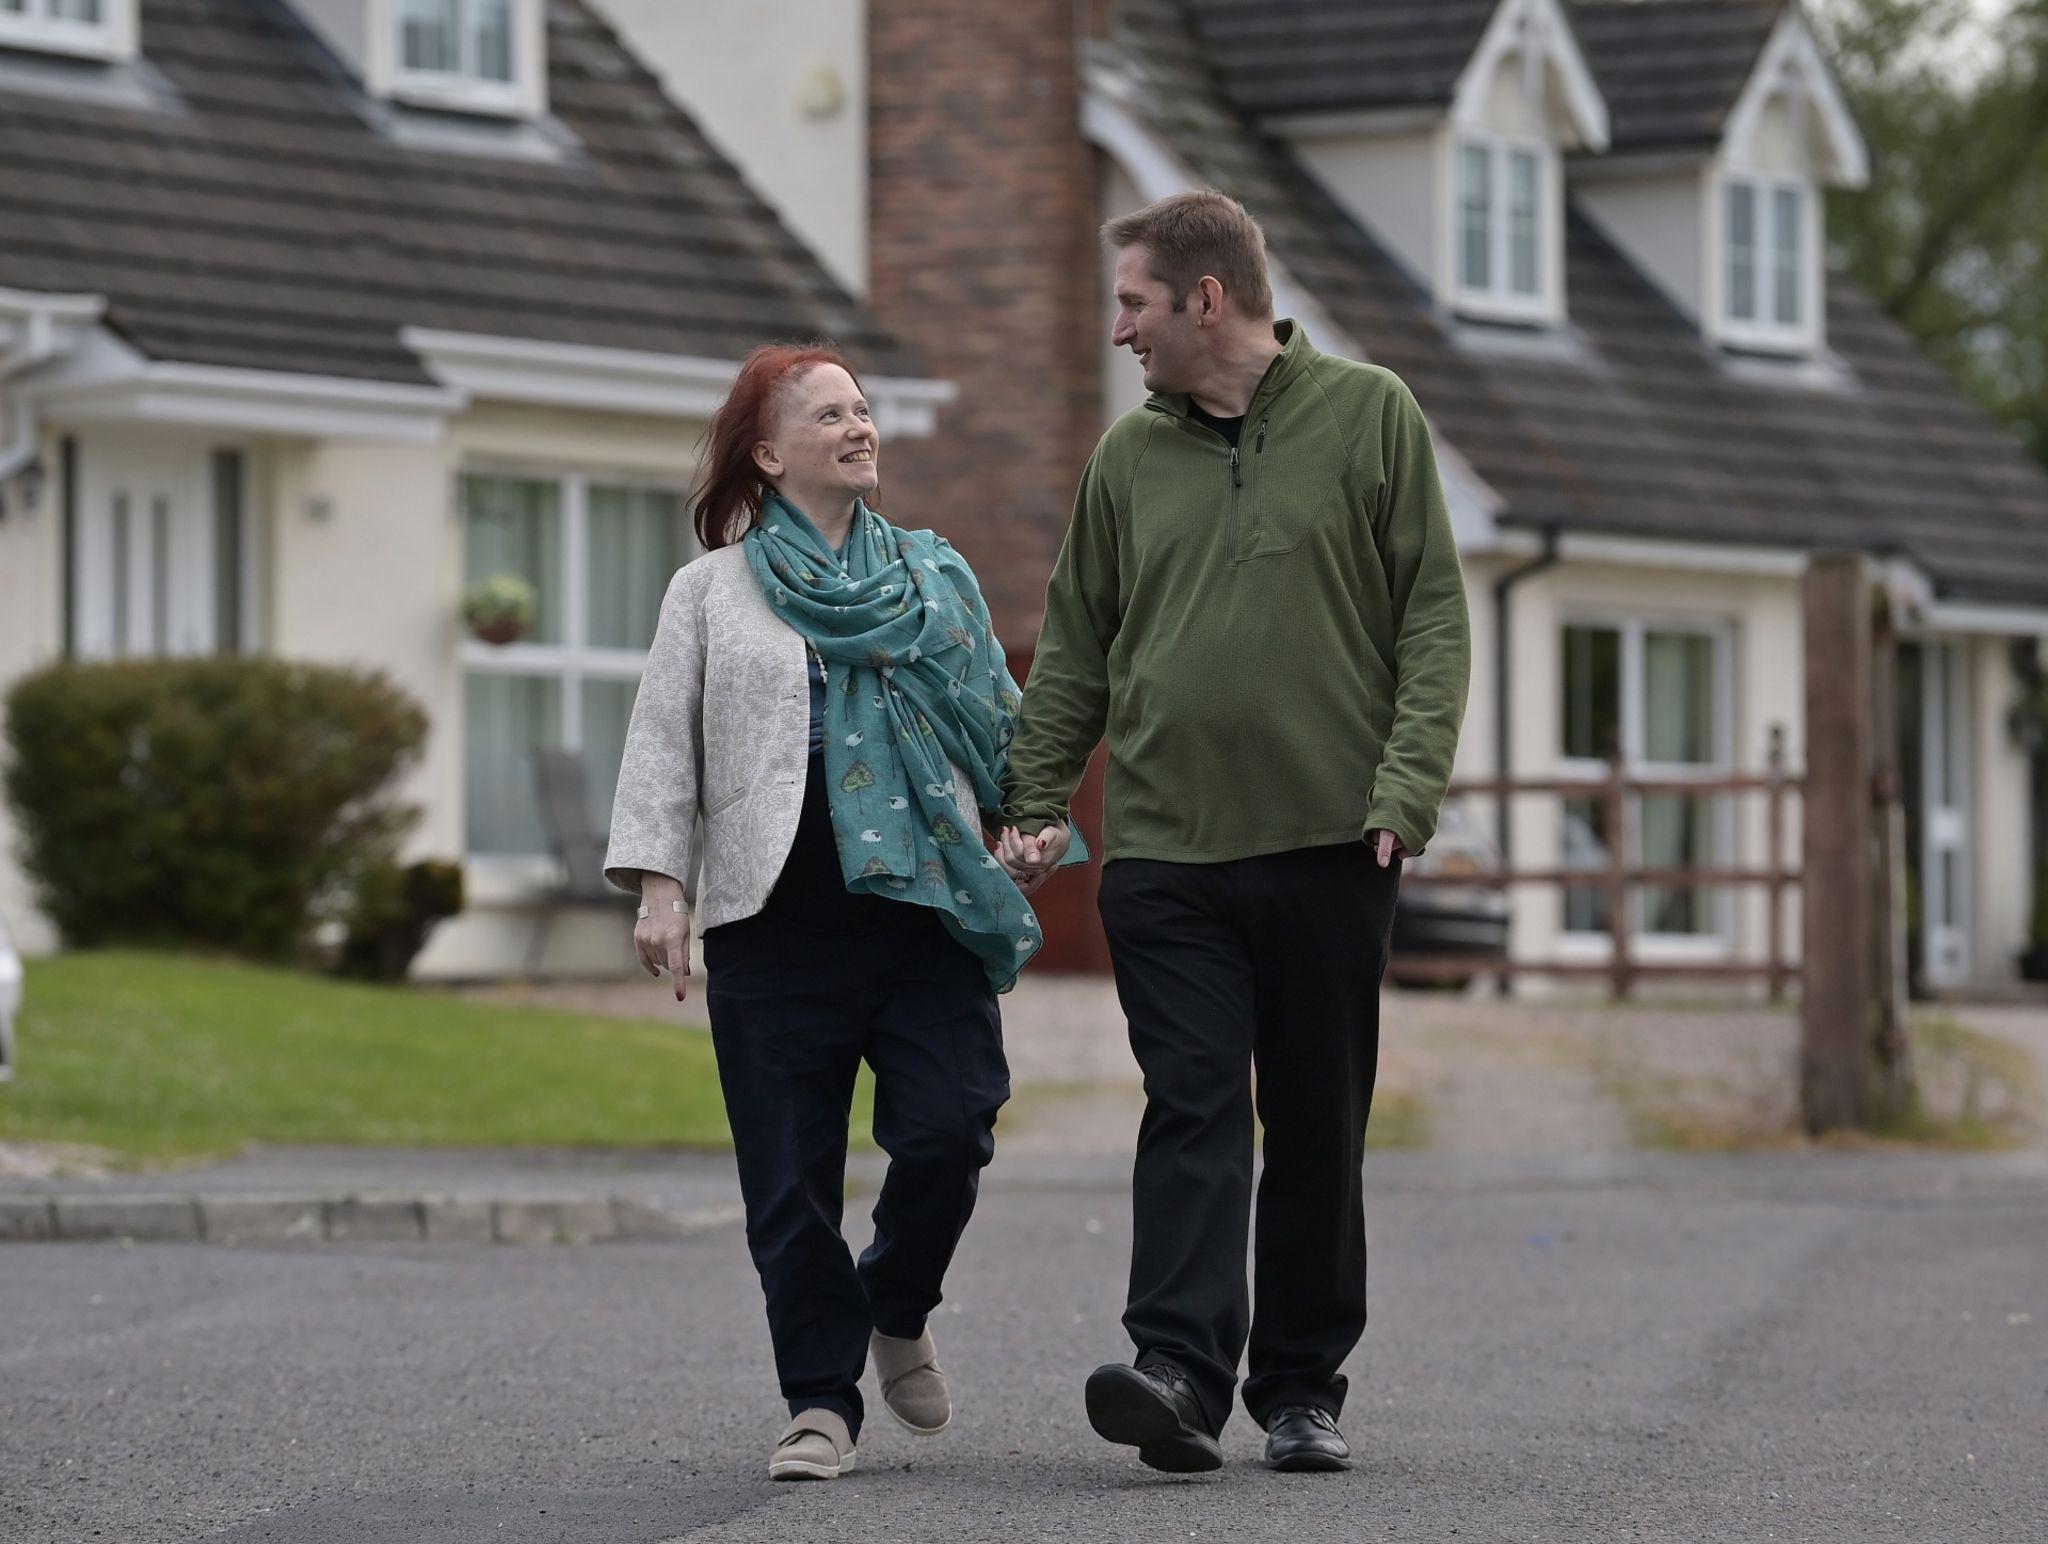 Heather and Adriaan walking near their home